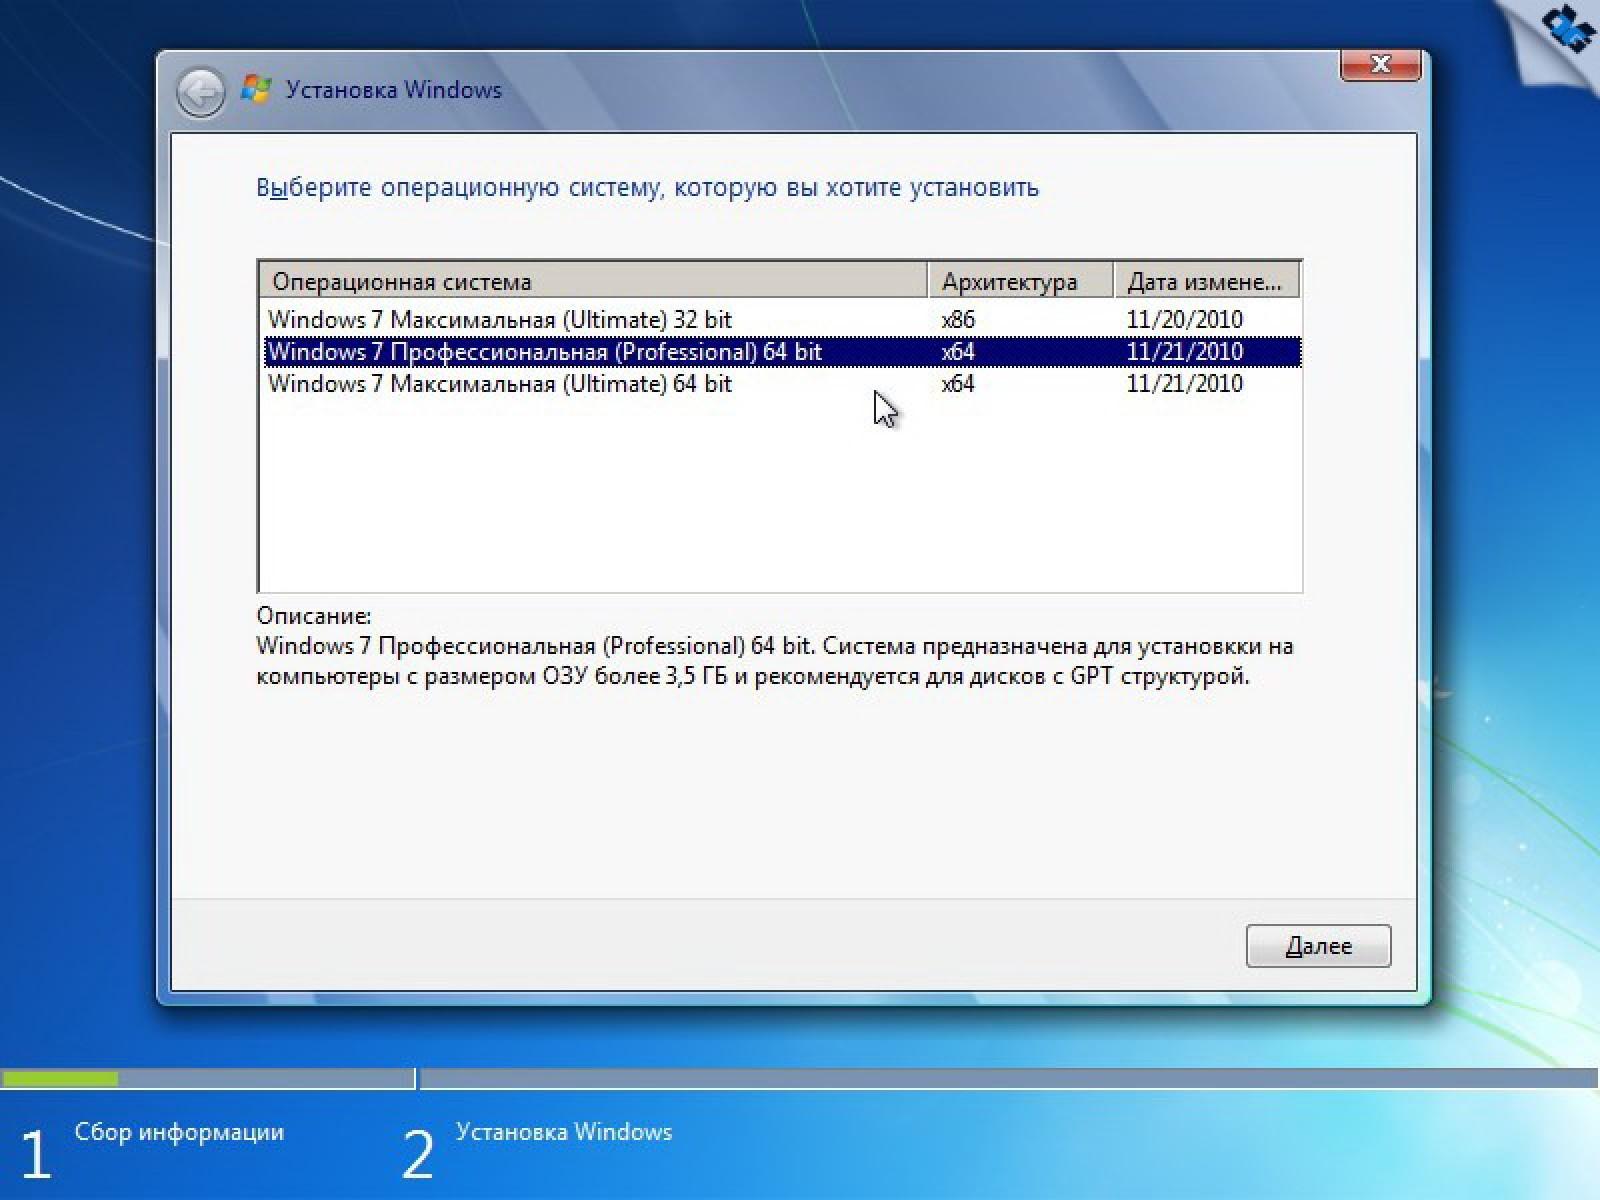 download Survey Methodology 2004